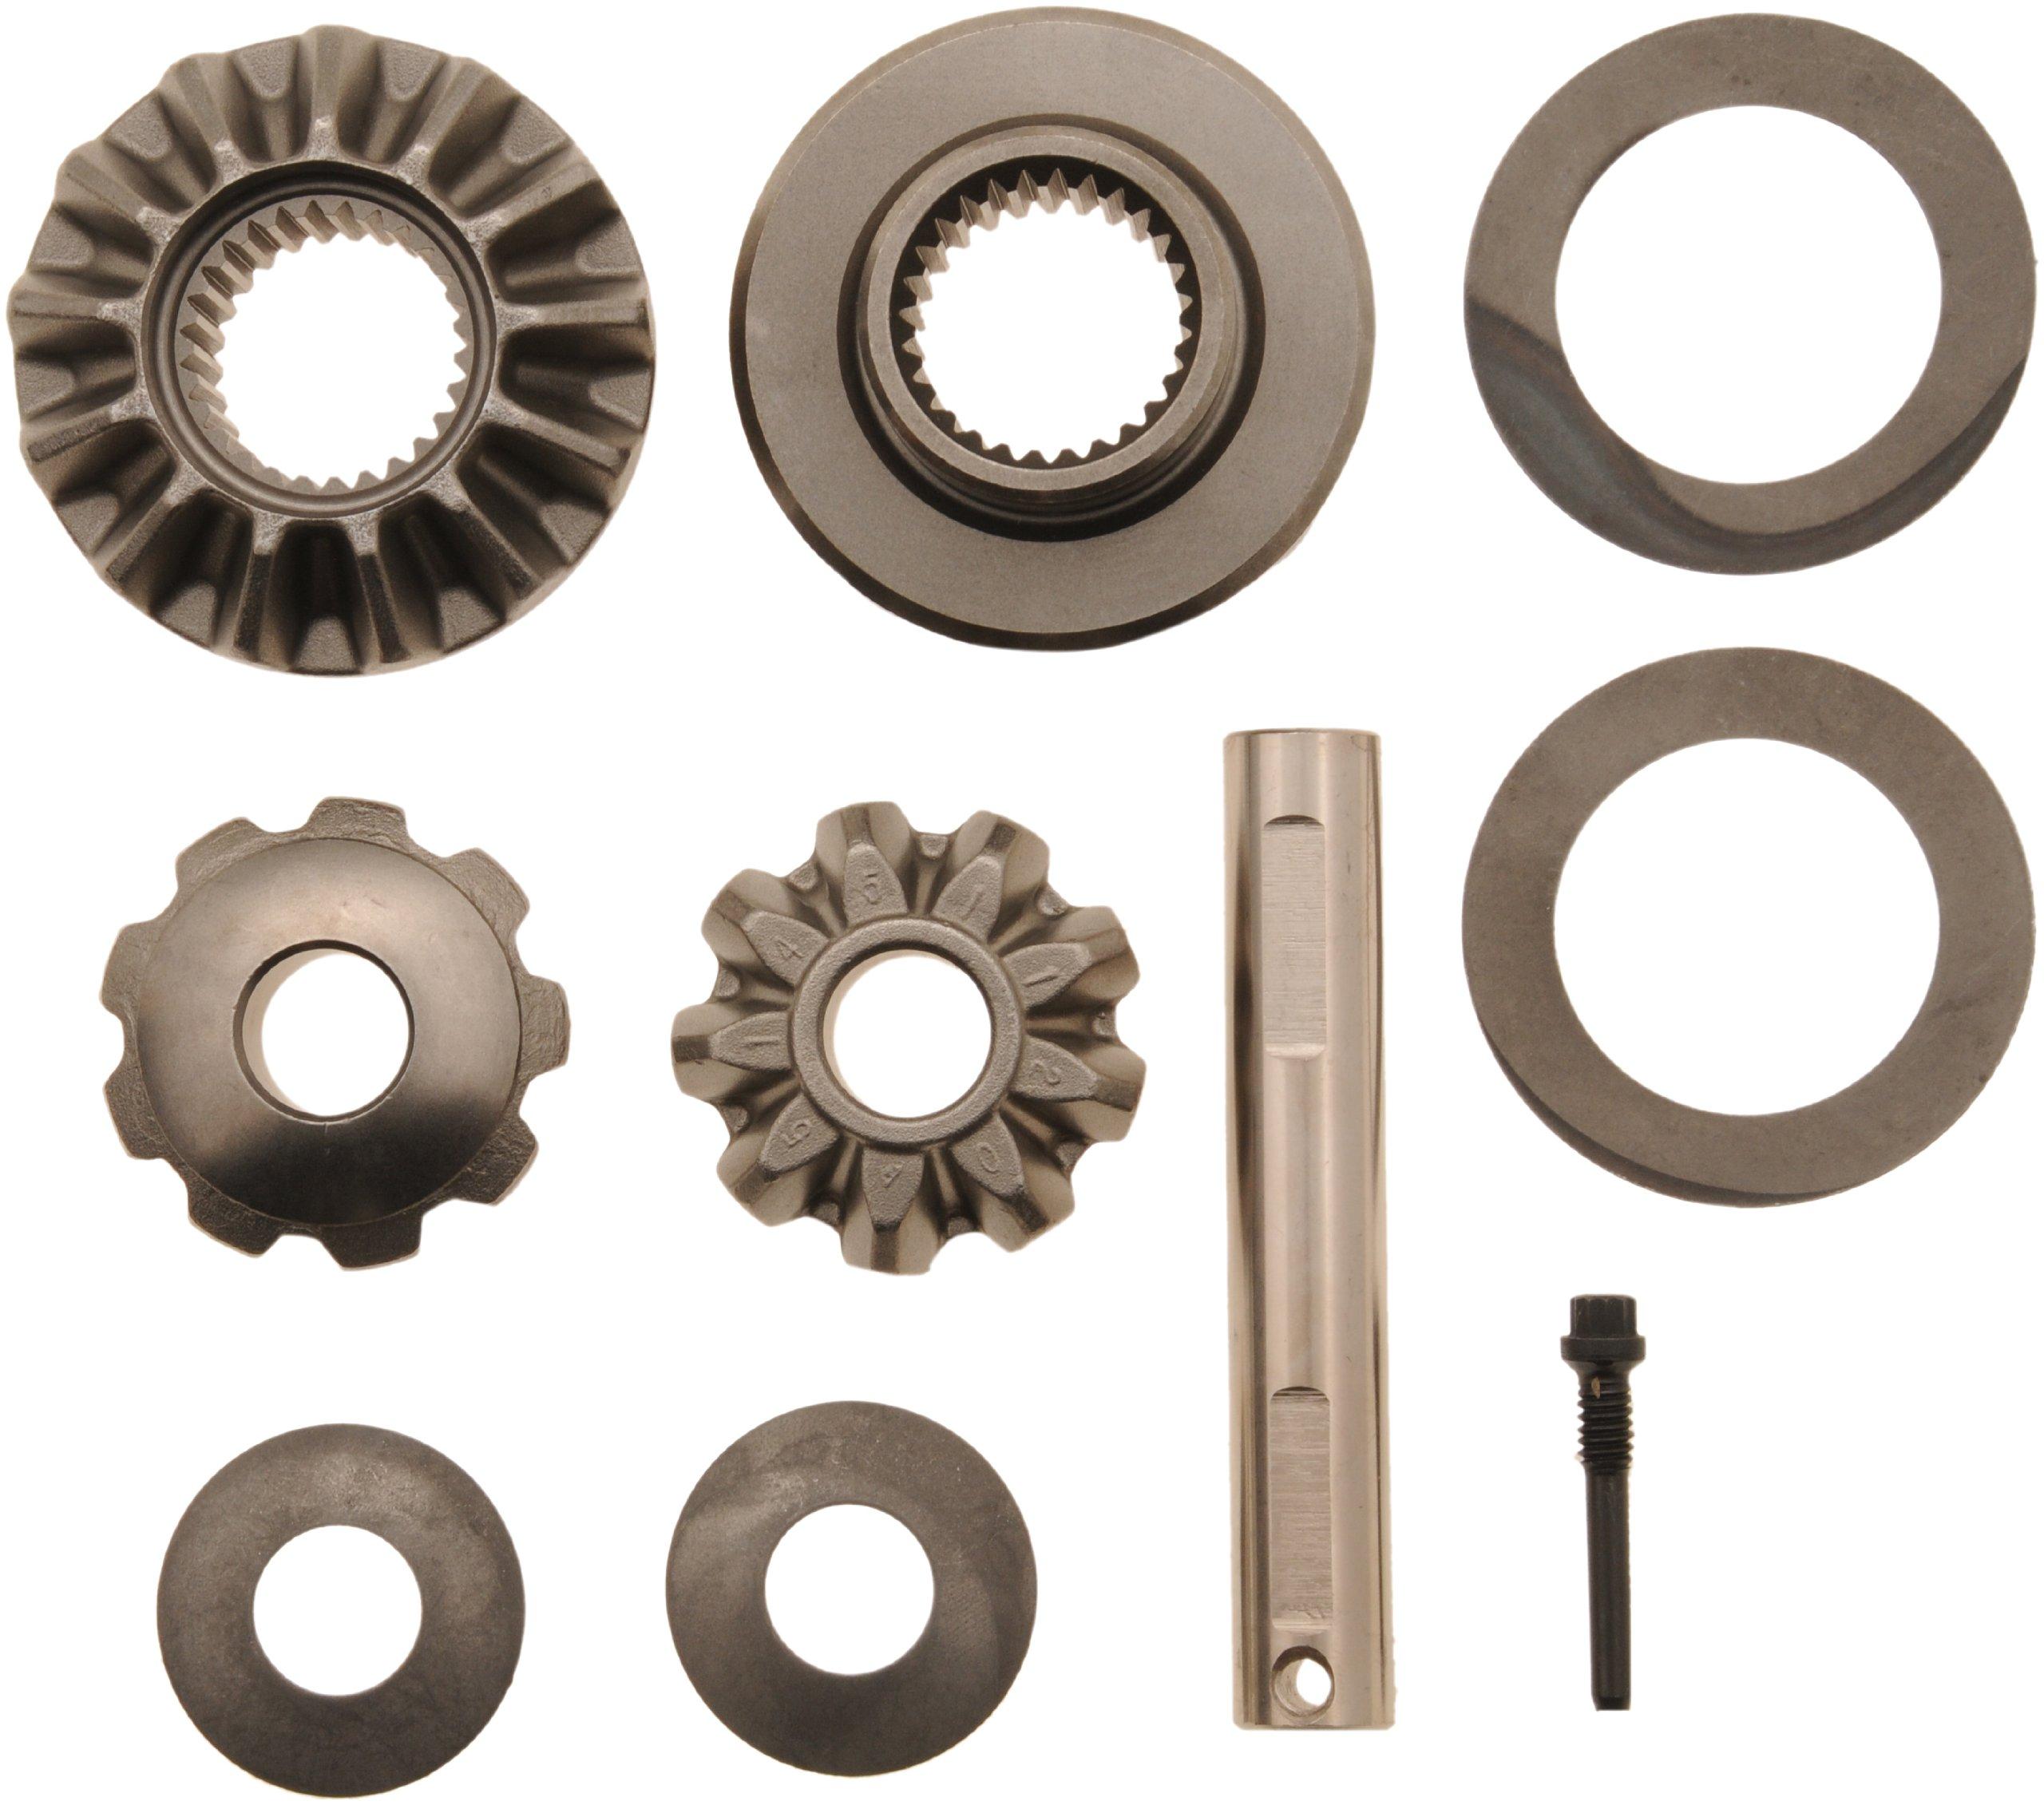 Spicer 707321X Differential Inner Gear Kit